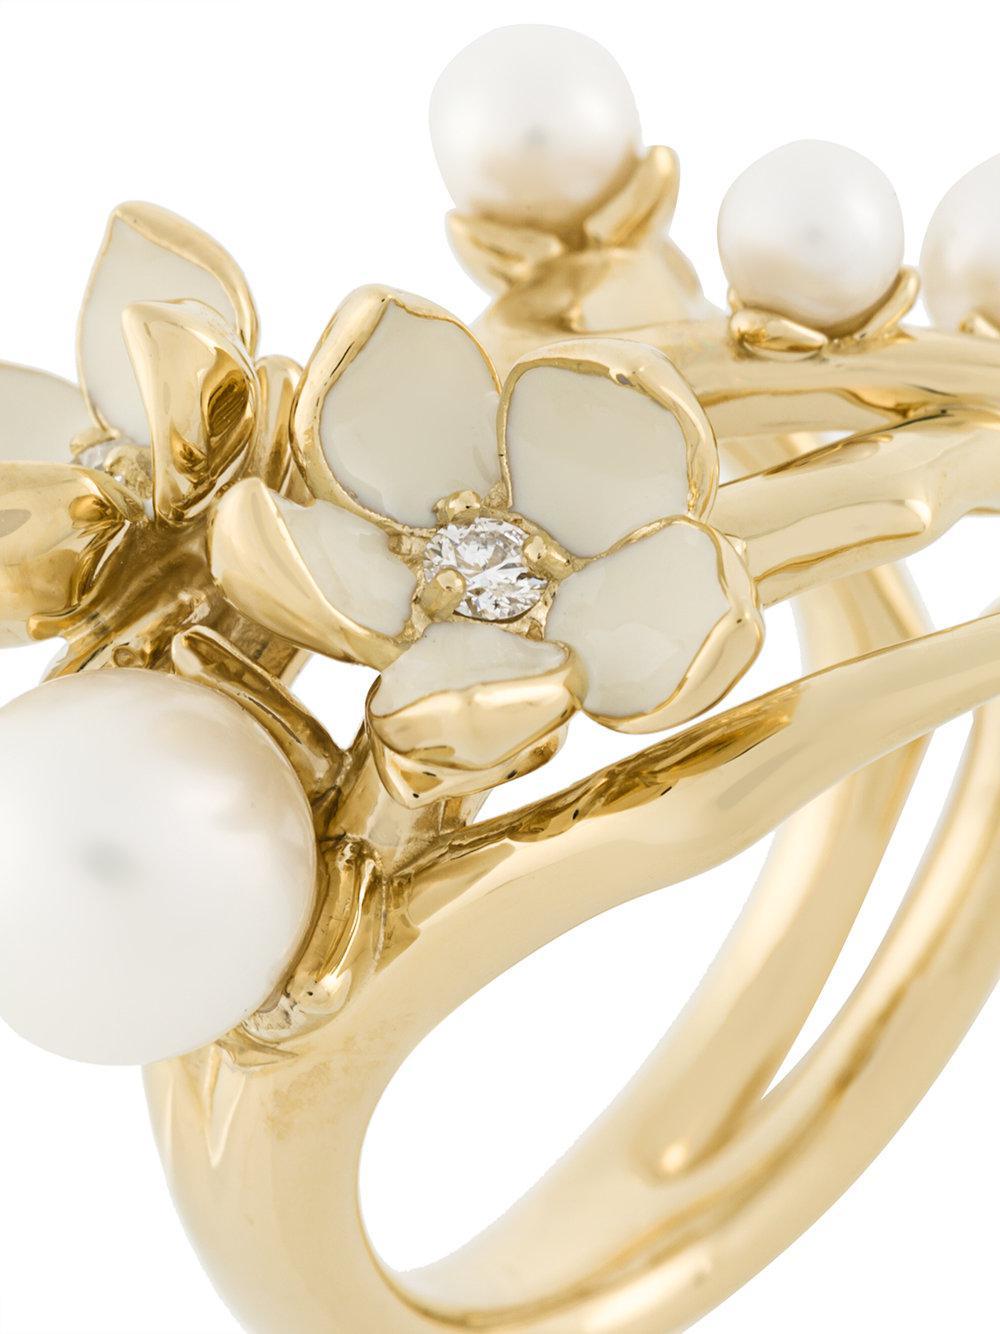 Cherry Blossom diamond ring - Metallic Shaun Leane qkvcEX